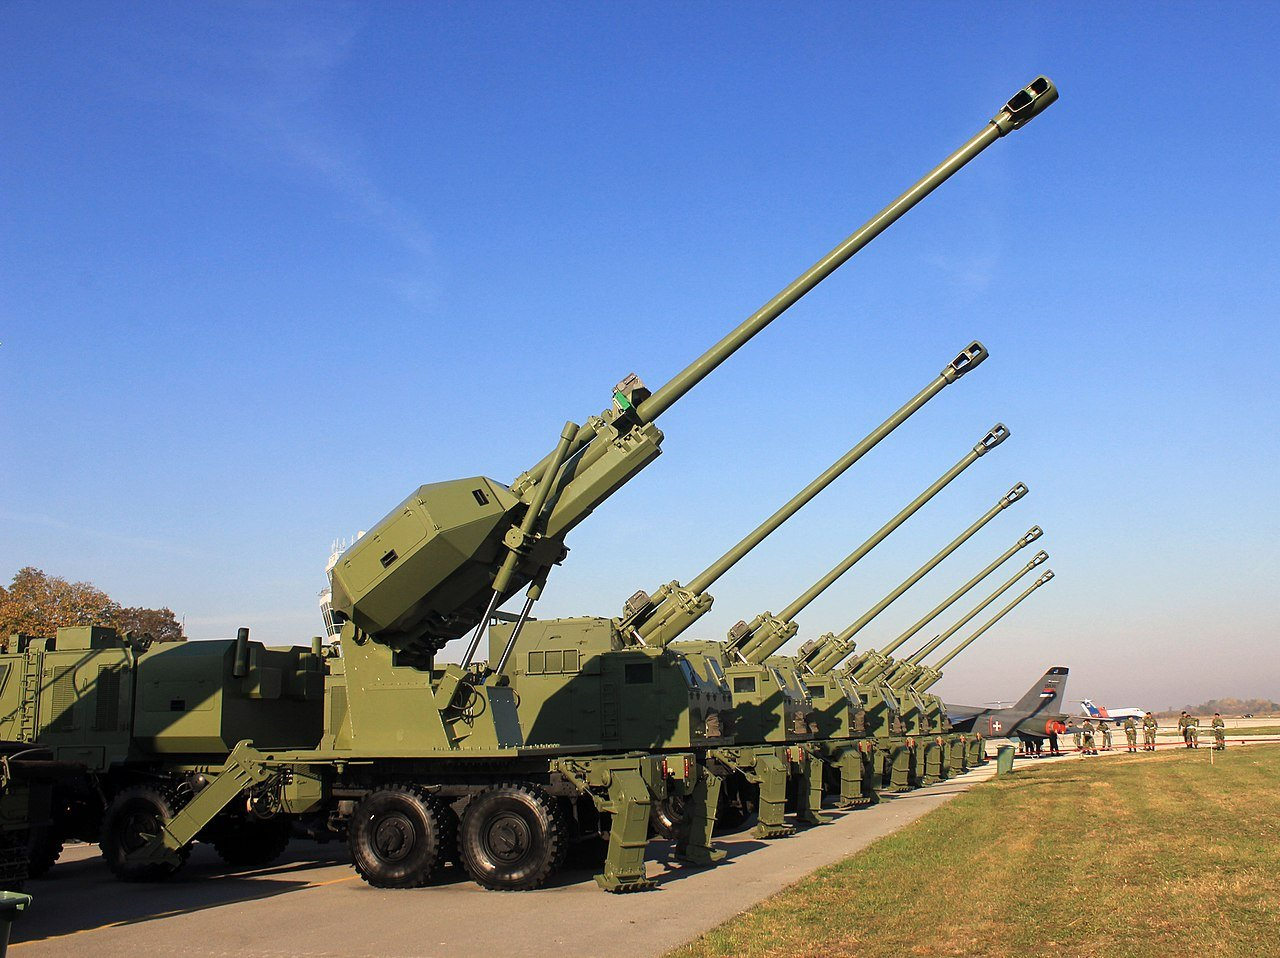 В Сербии представлена 155-мм самоходная гаубица Александар